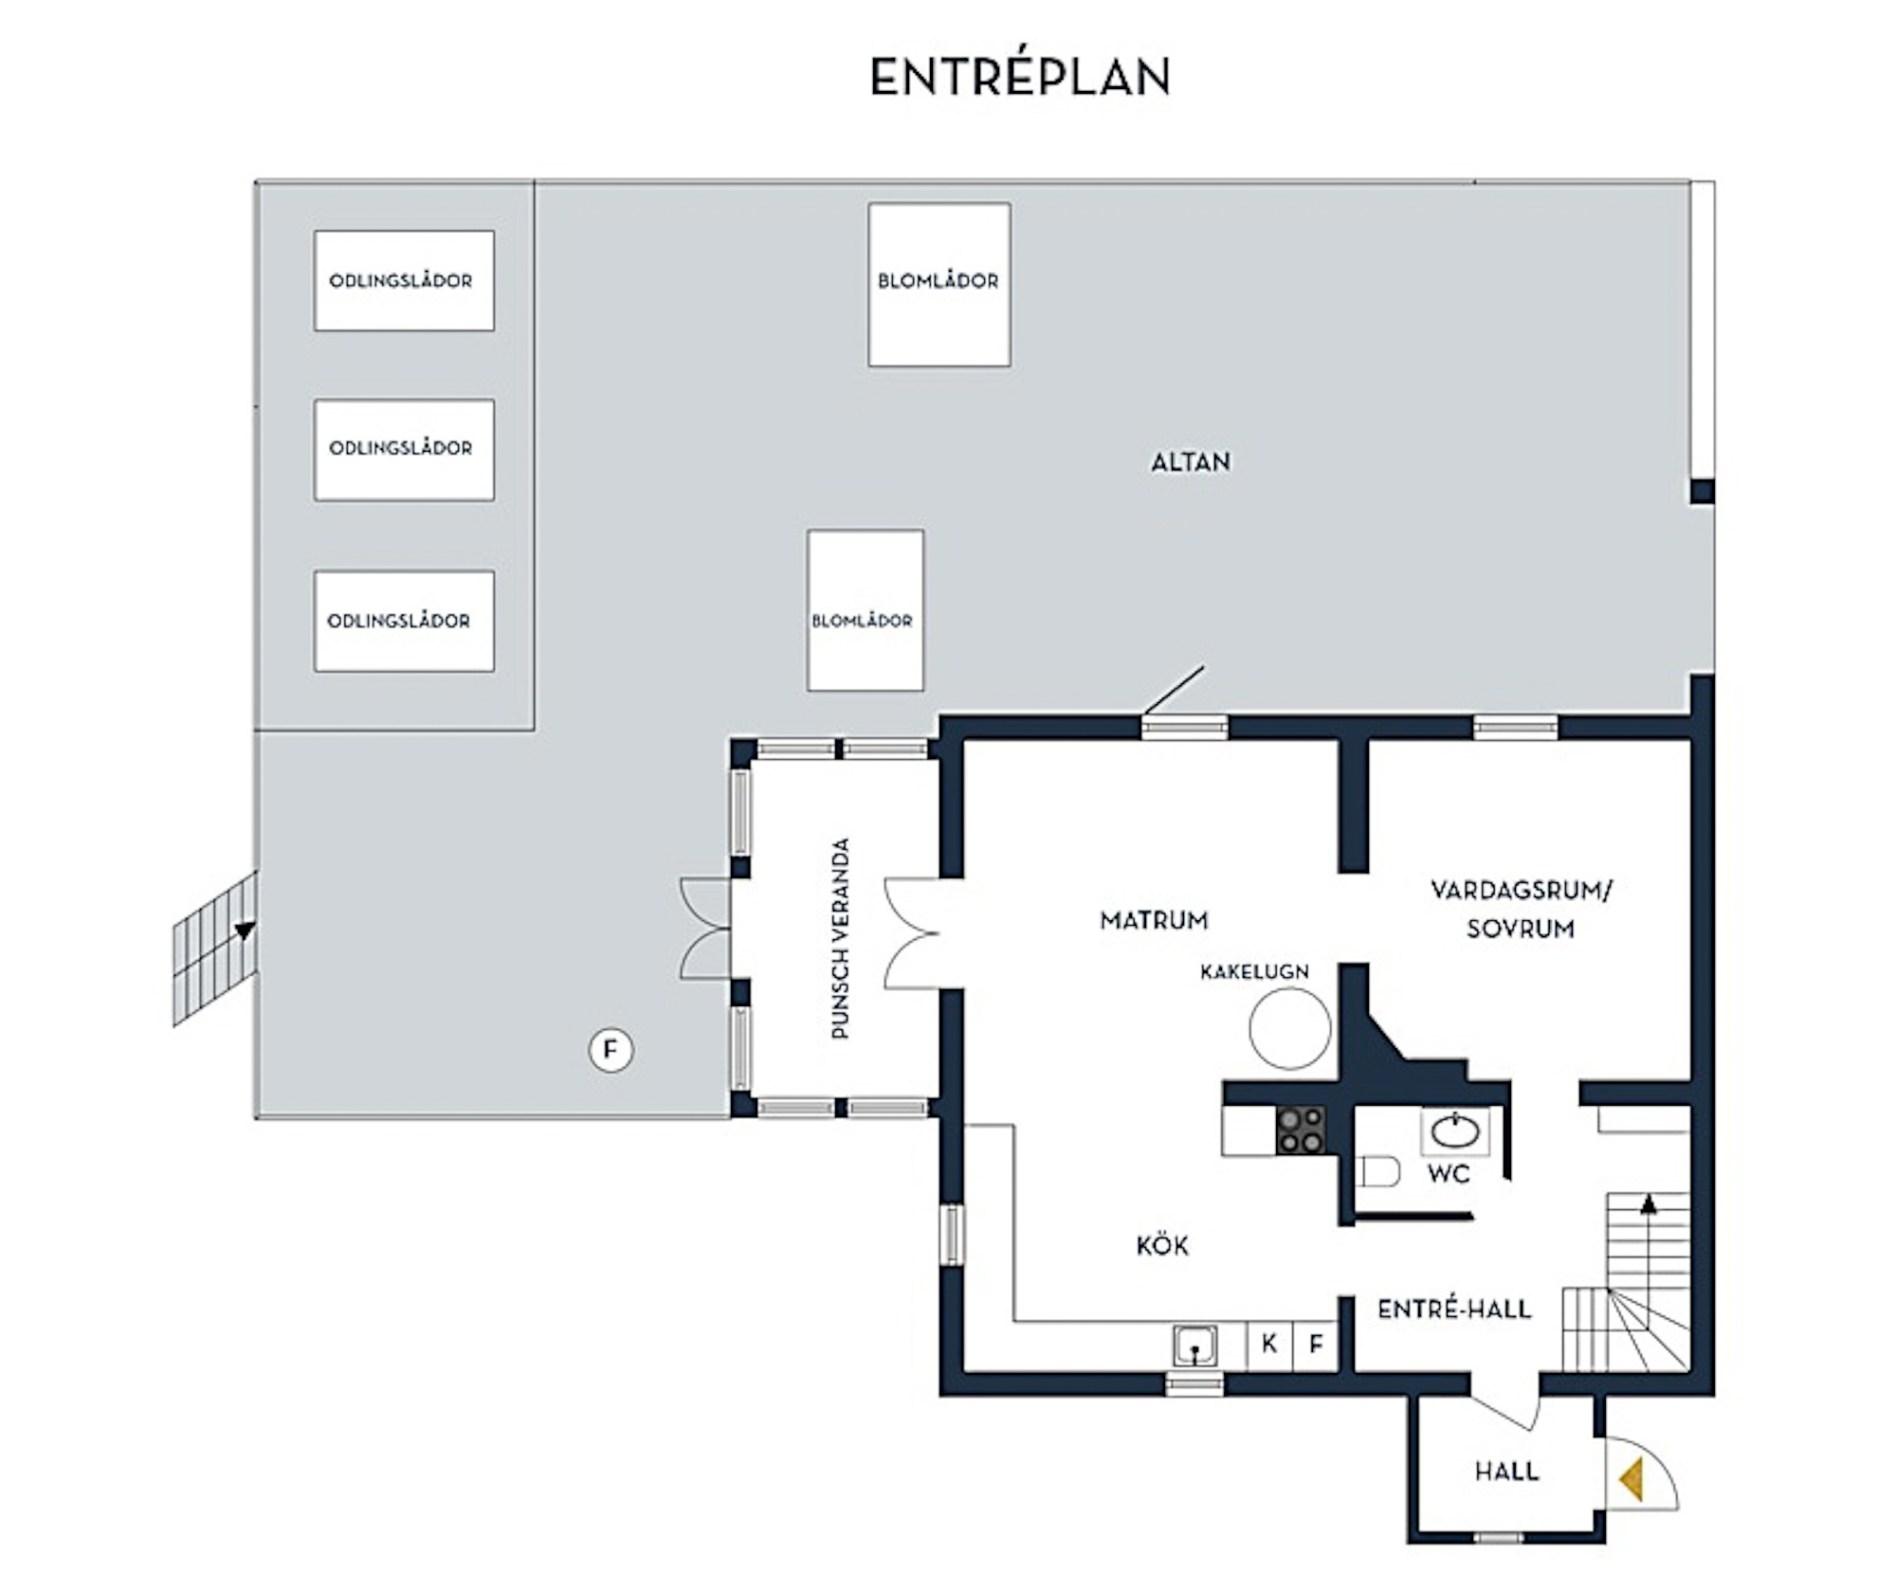 33512 house floor plan 02